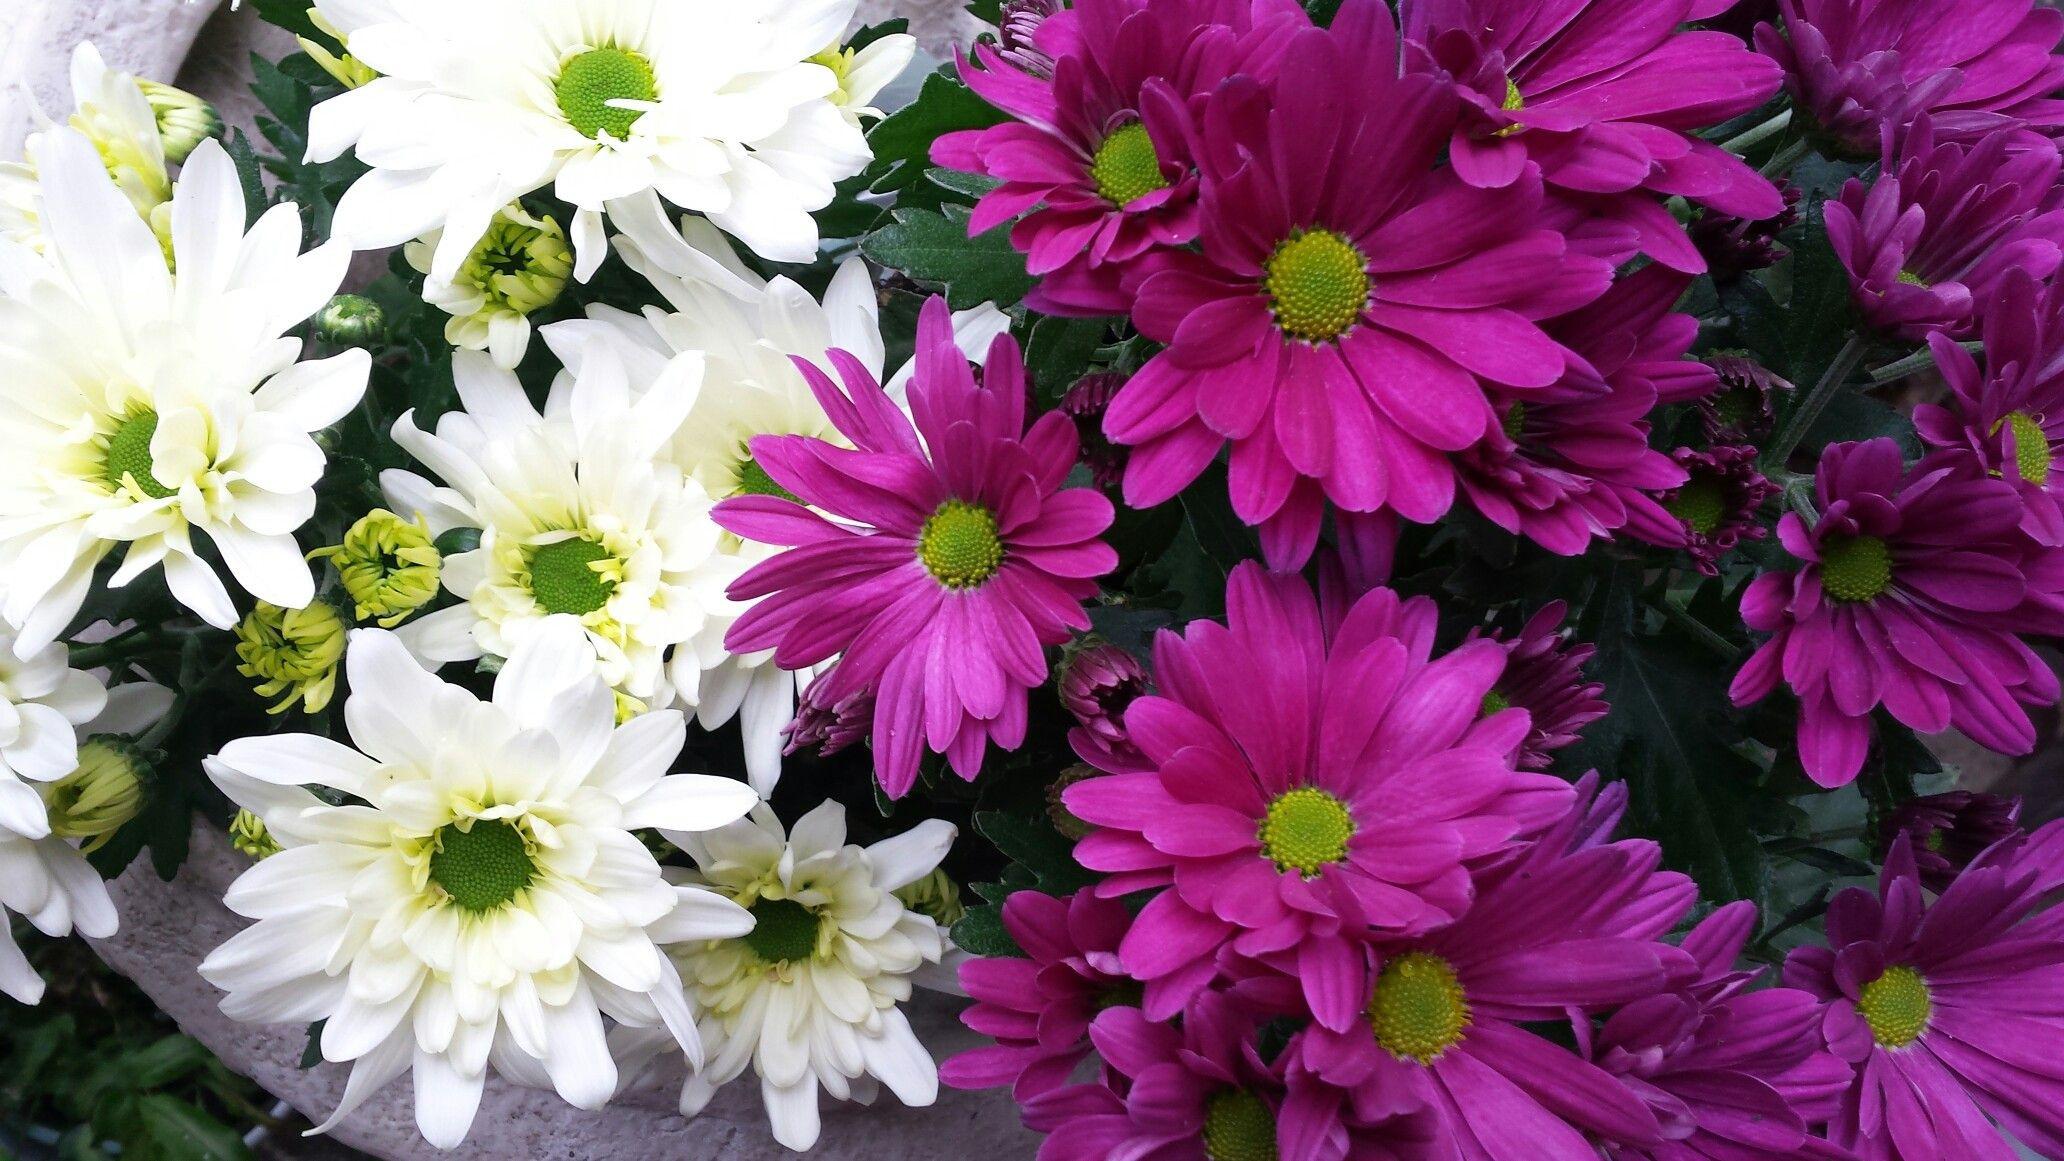 Potted Chrysanthemum plants